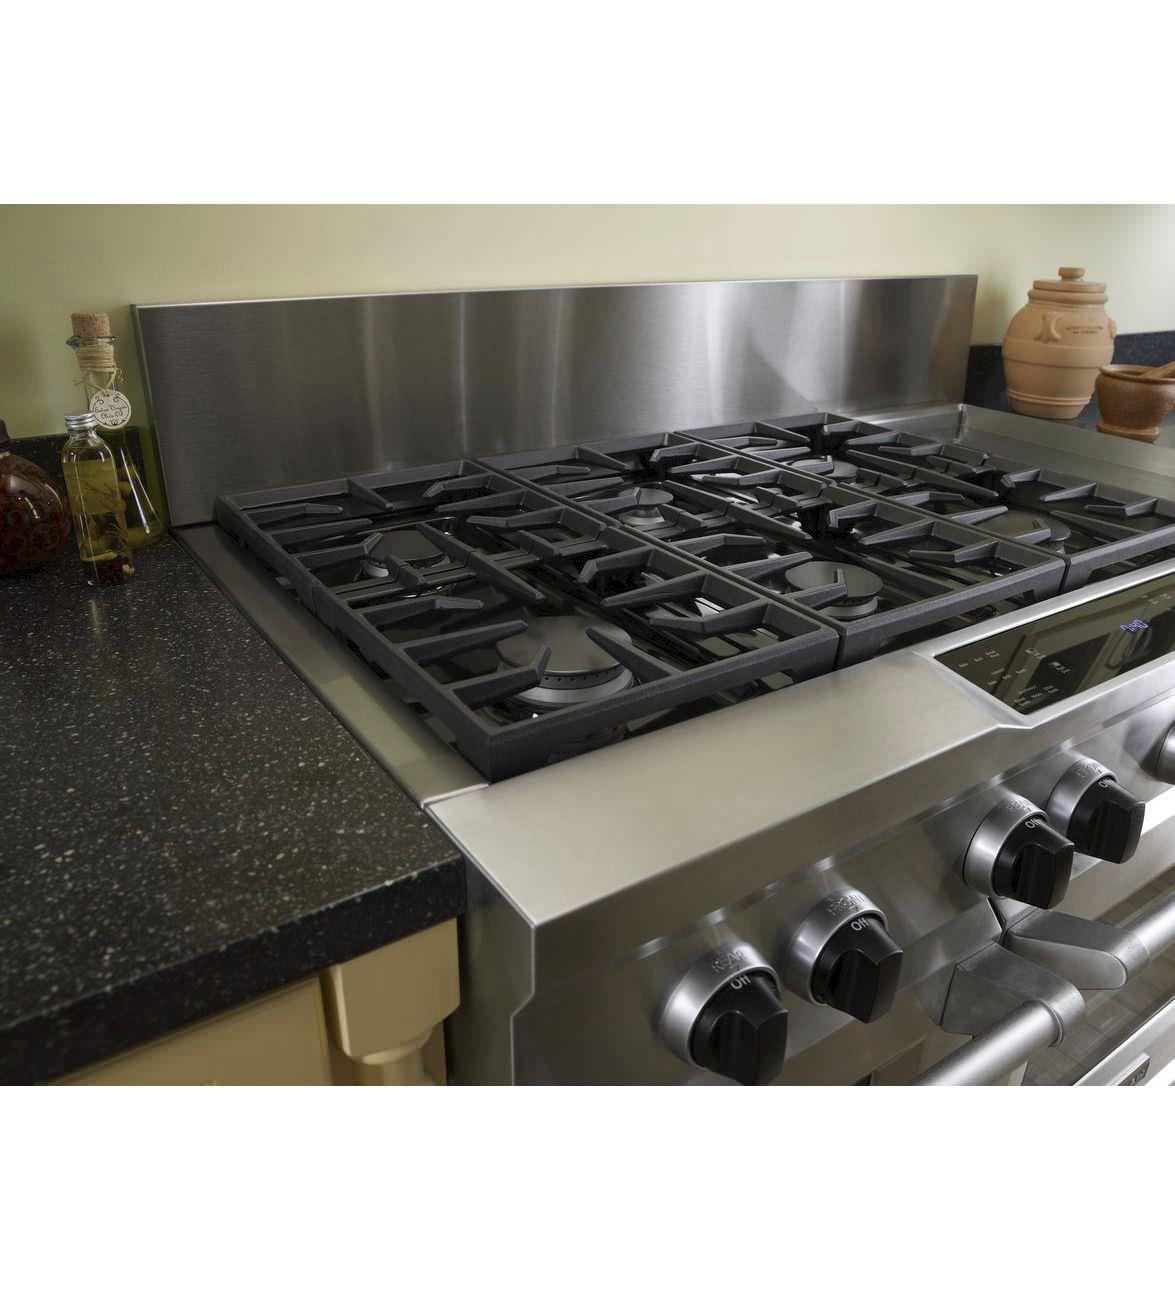 Blocco cucina a gas - KDRS483VSS - KitchenAid